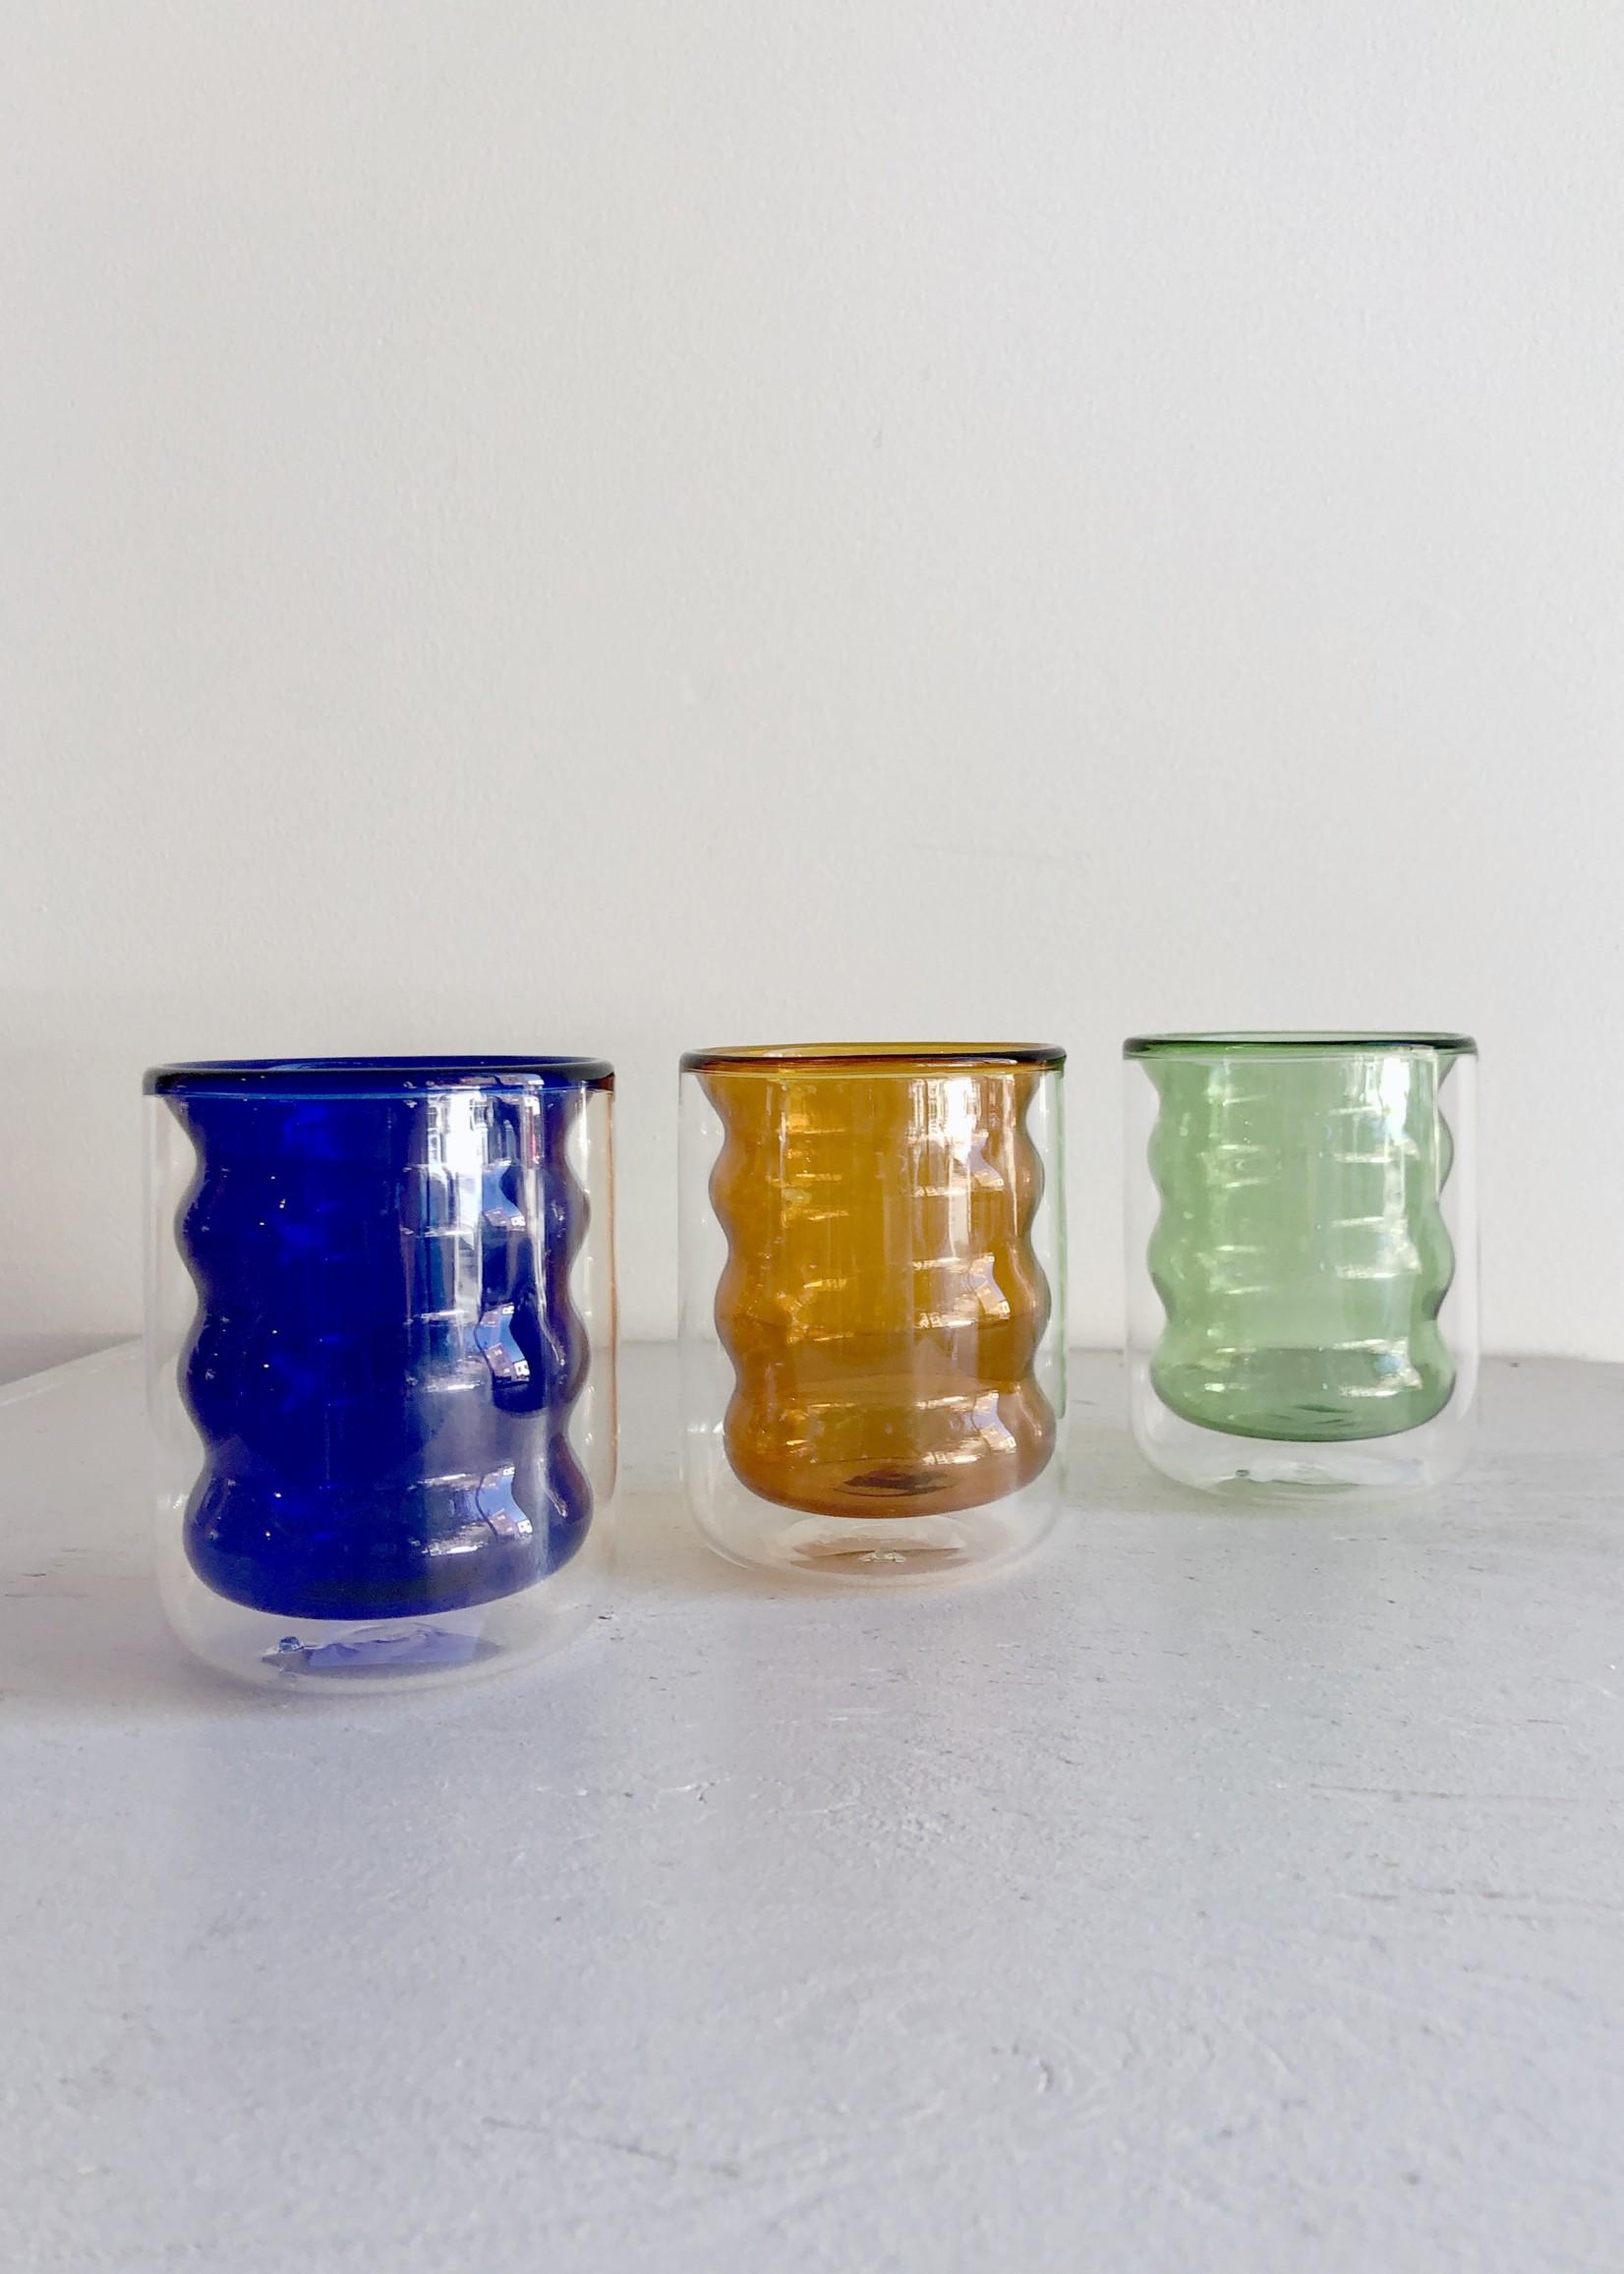 Poketo Double Wall Groovy Cup by Poketo